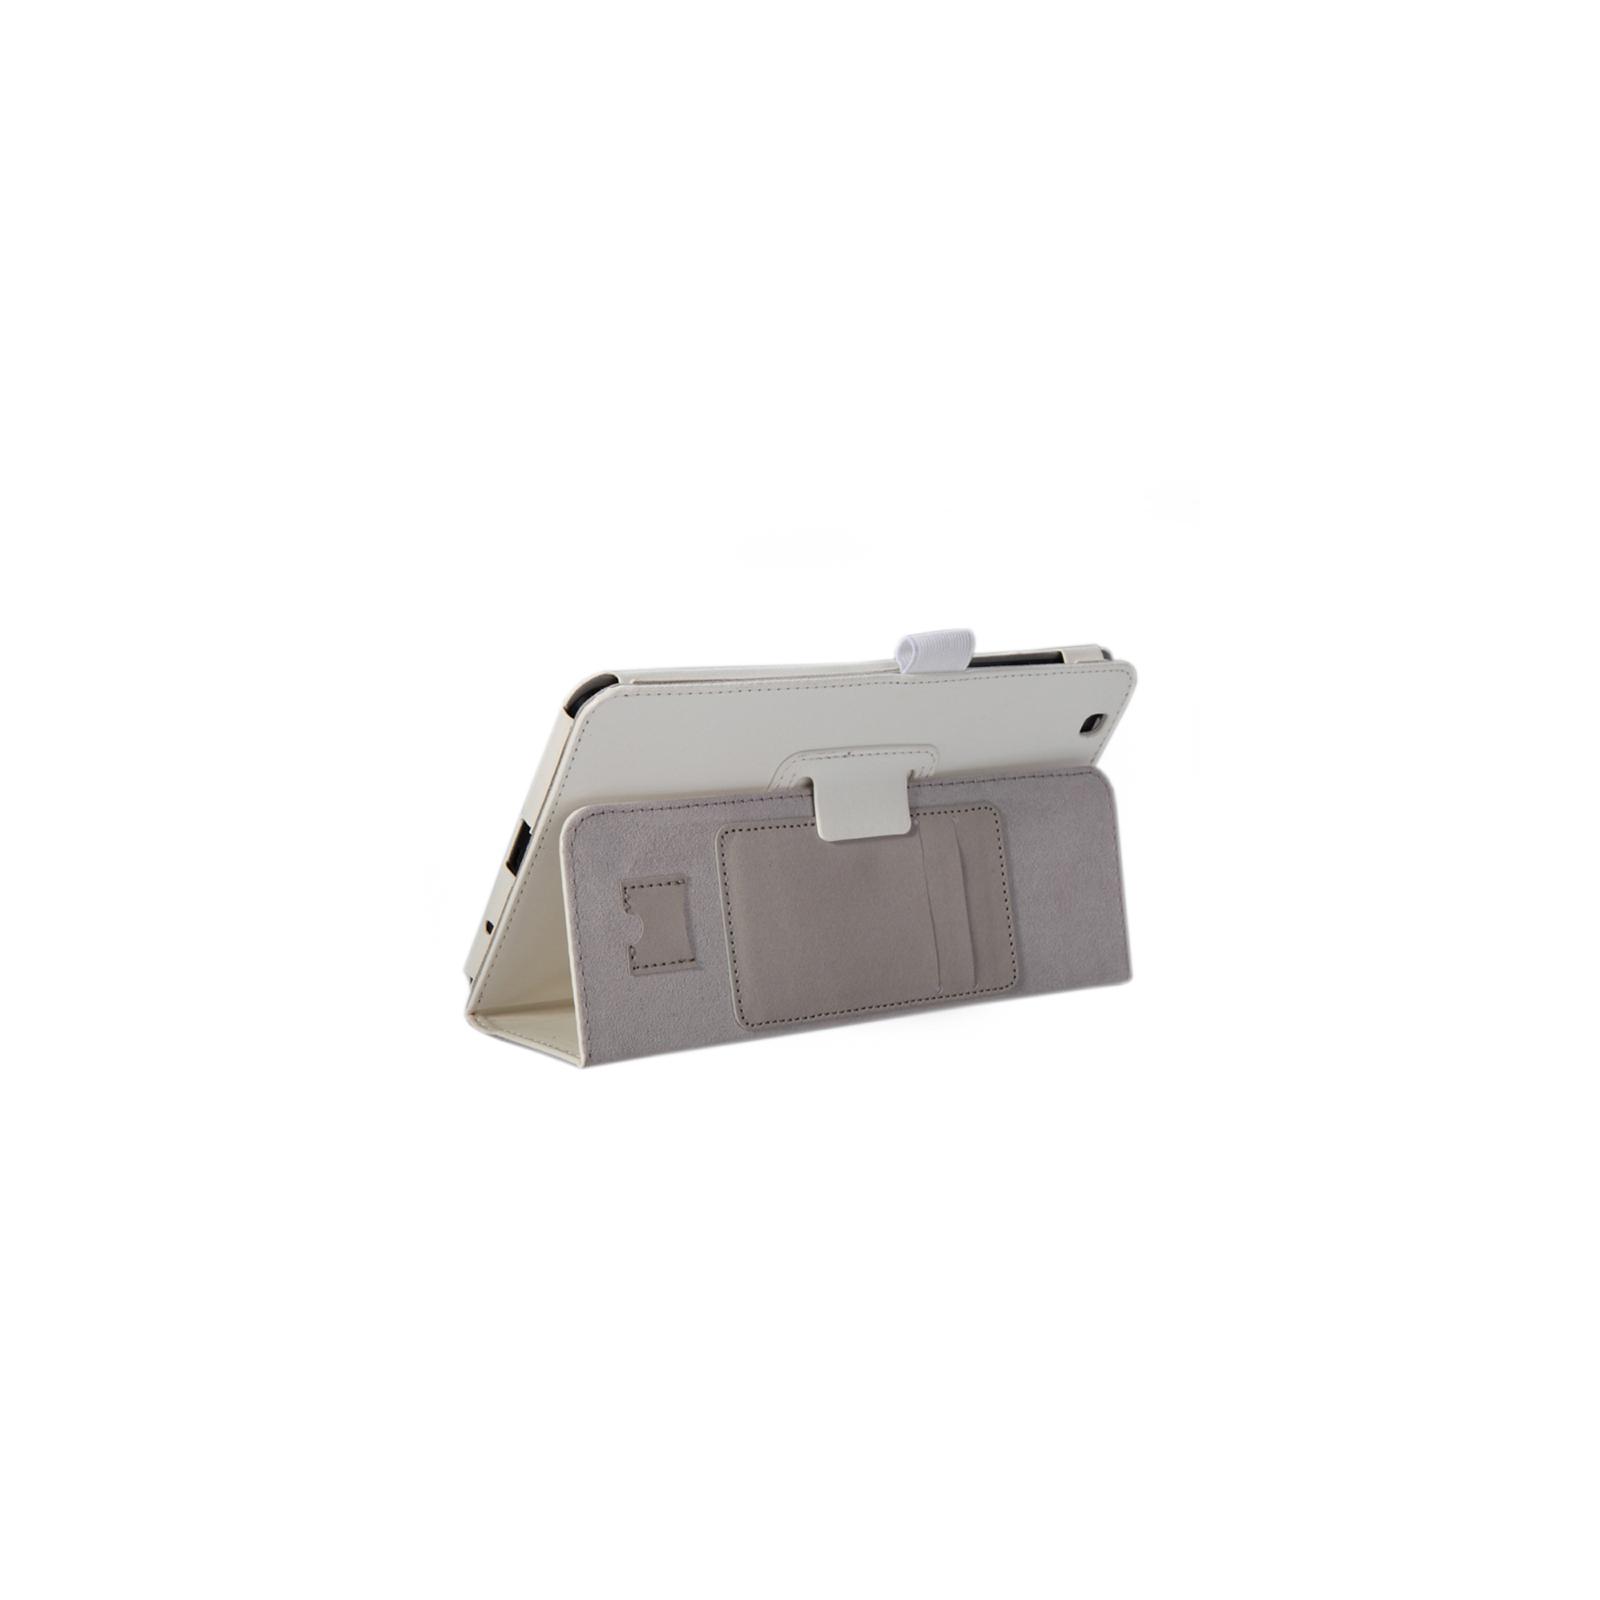 Чехол для планшета AirOn для LG G Pad 8.3 white (6946795850113) изображение 4